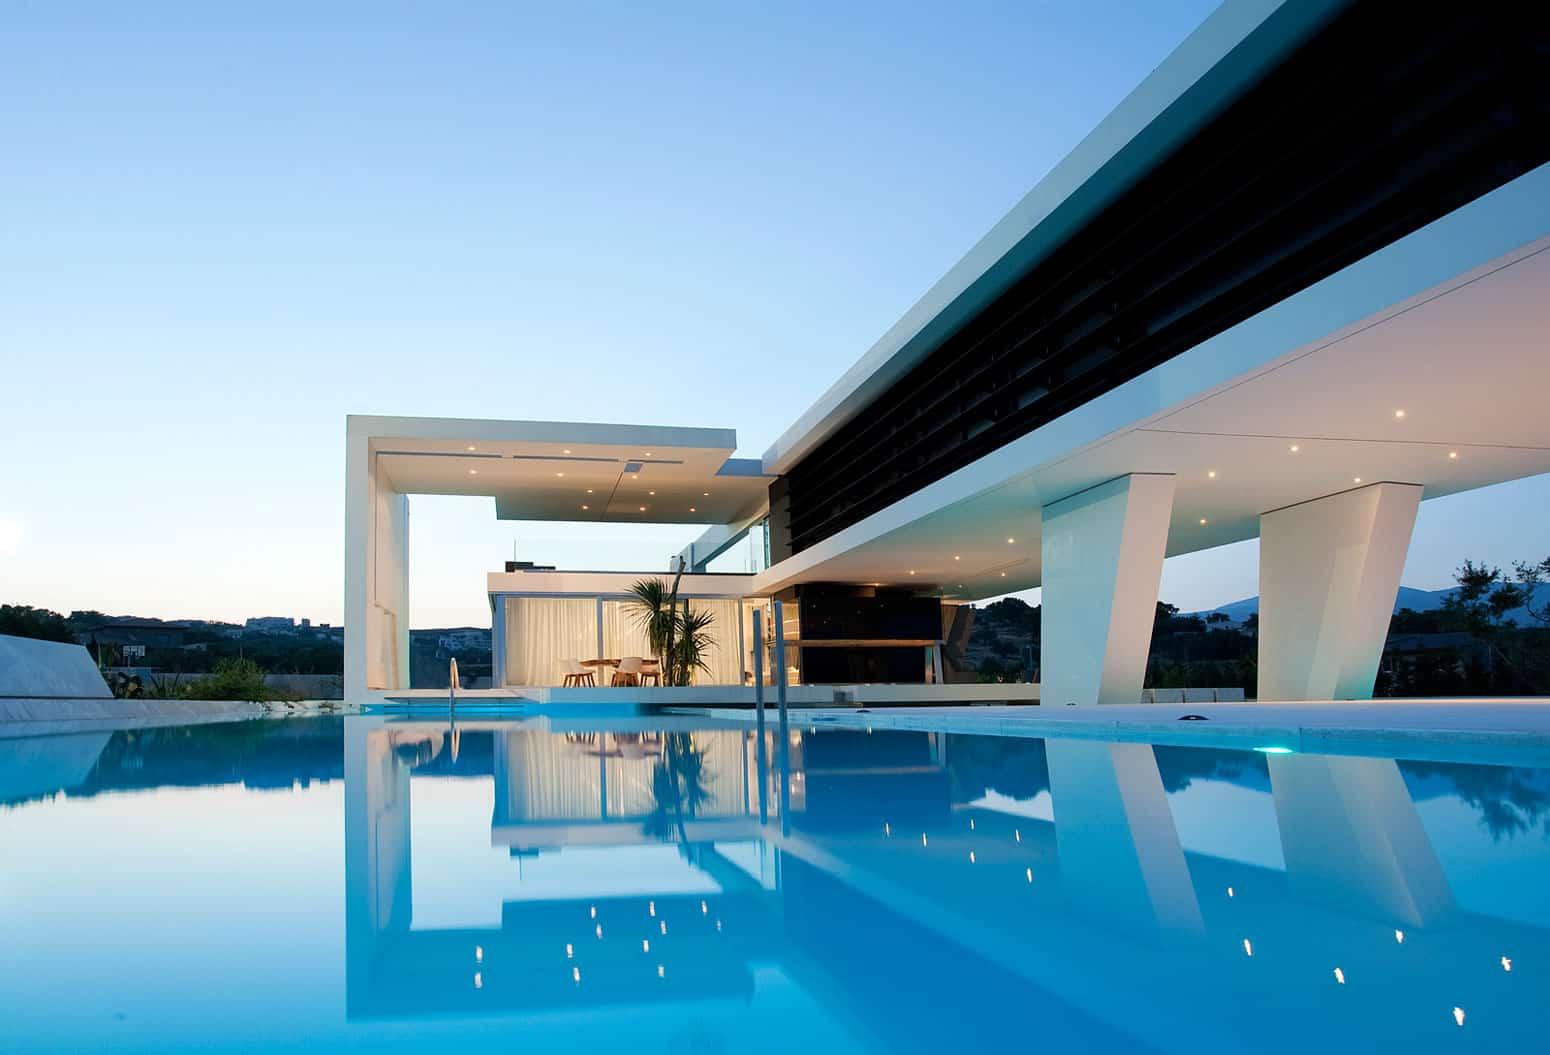 H3 by 314 Architecture Studio